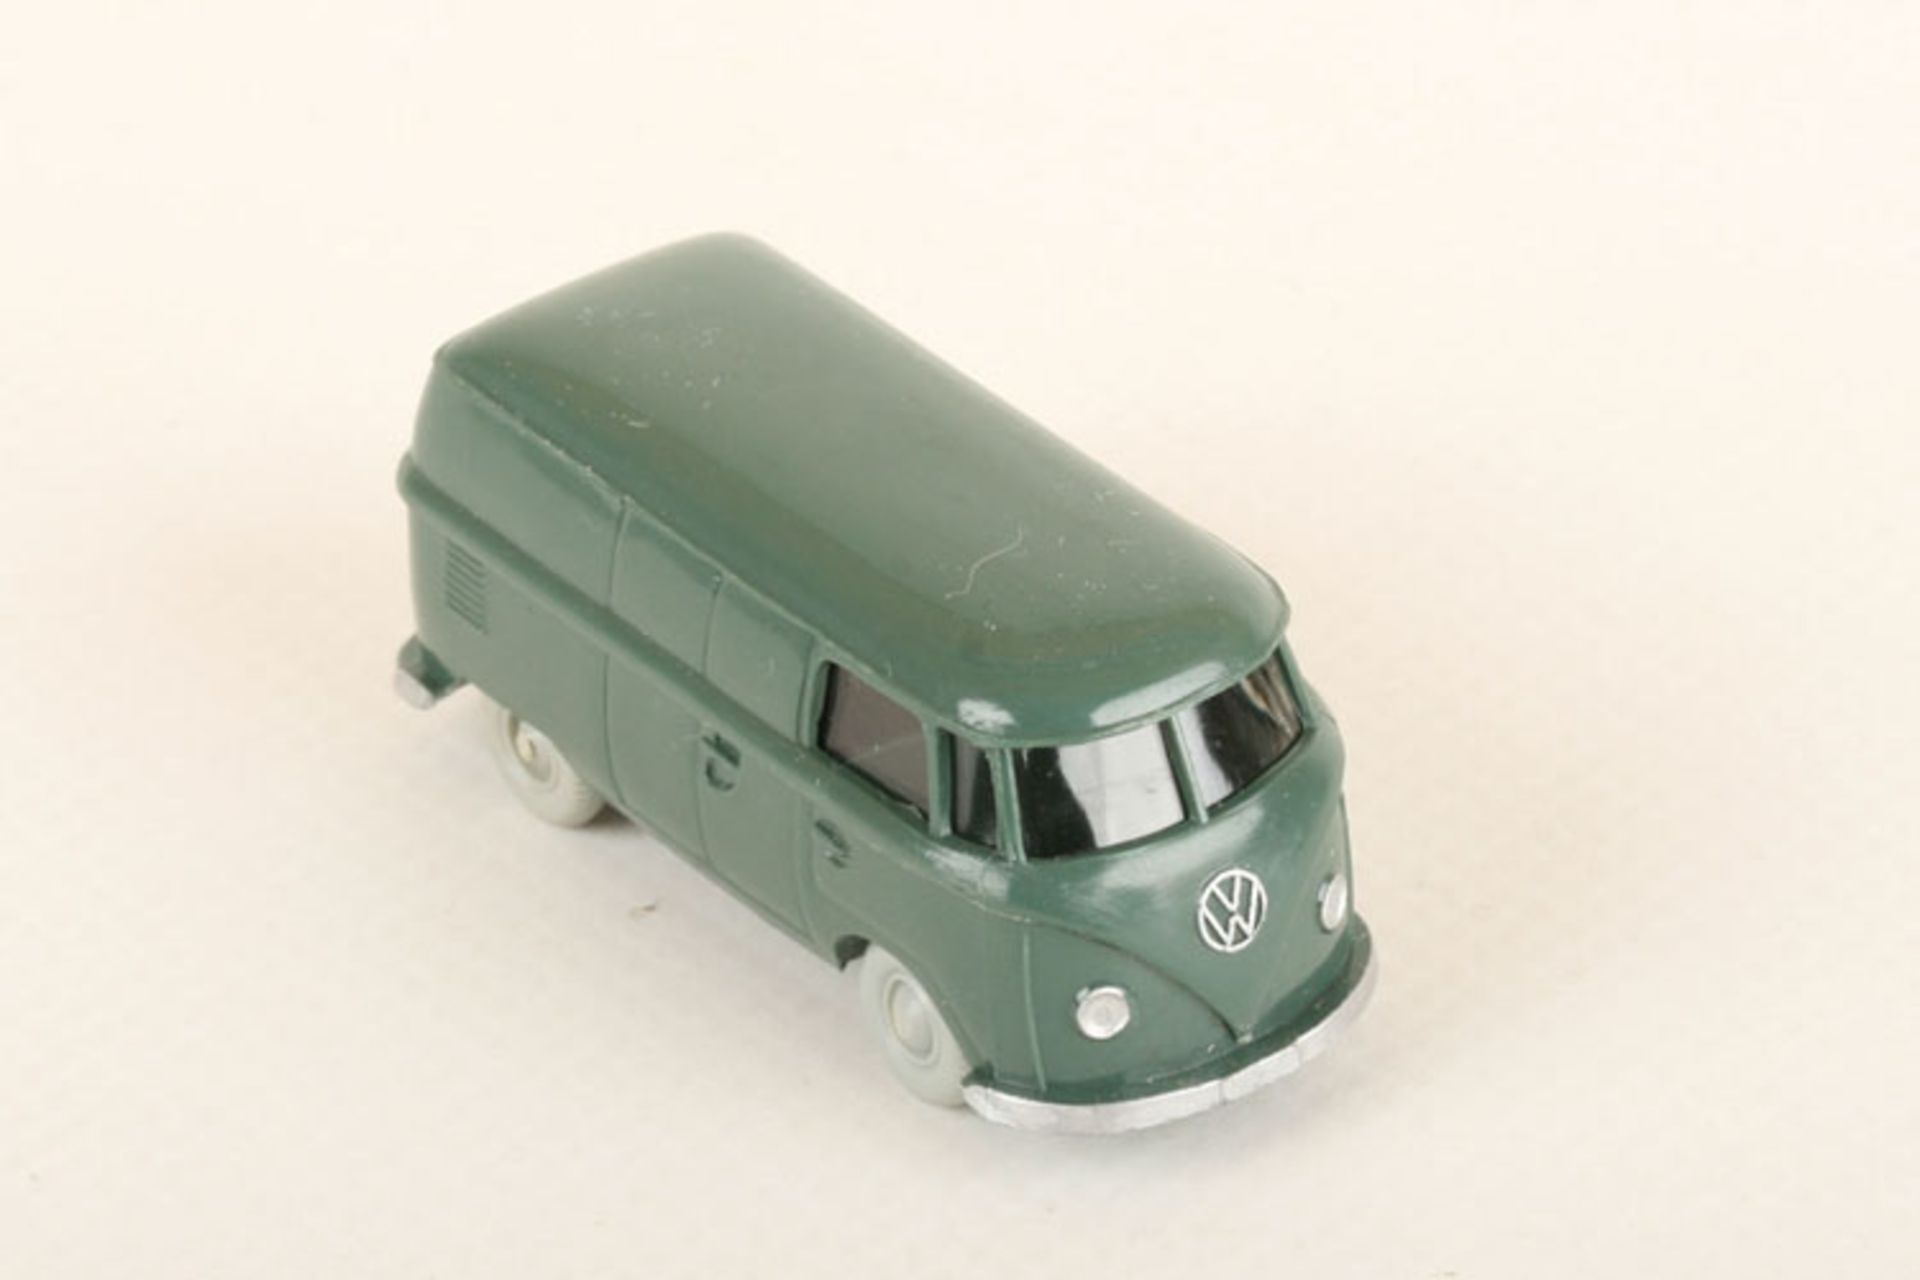 Los 1059 - Wiking VW T1 Kasten graugrün 300/9a, neuwertig